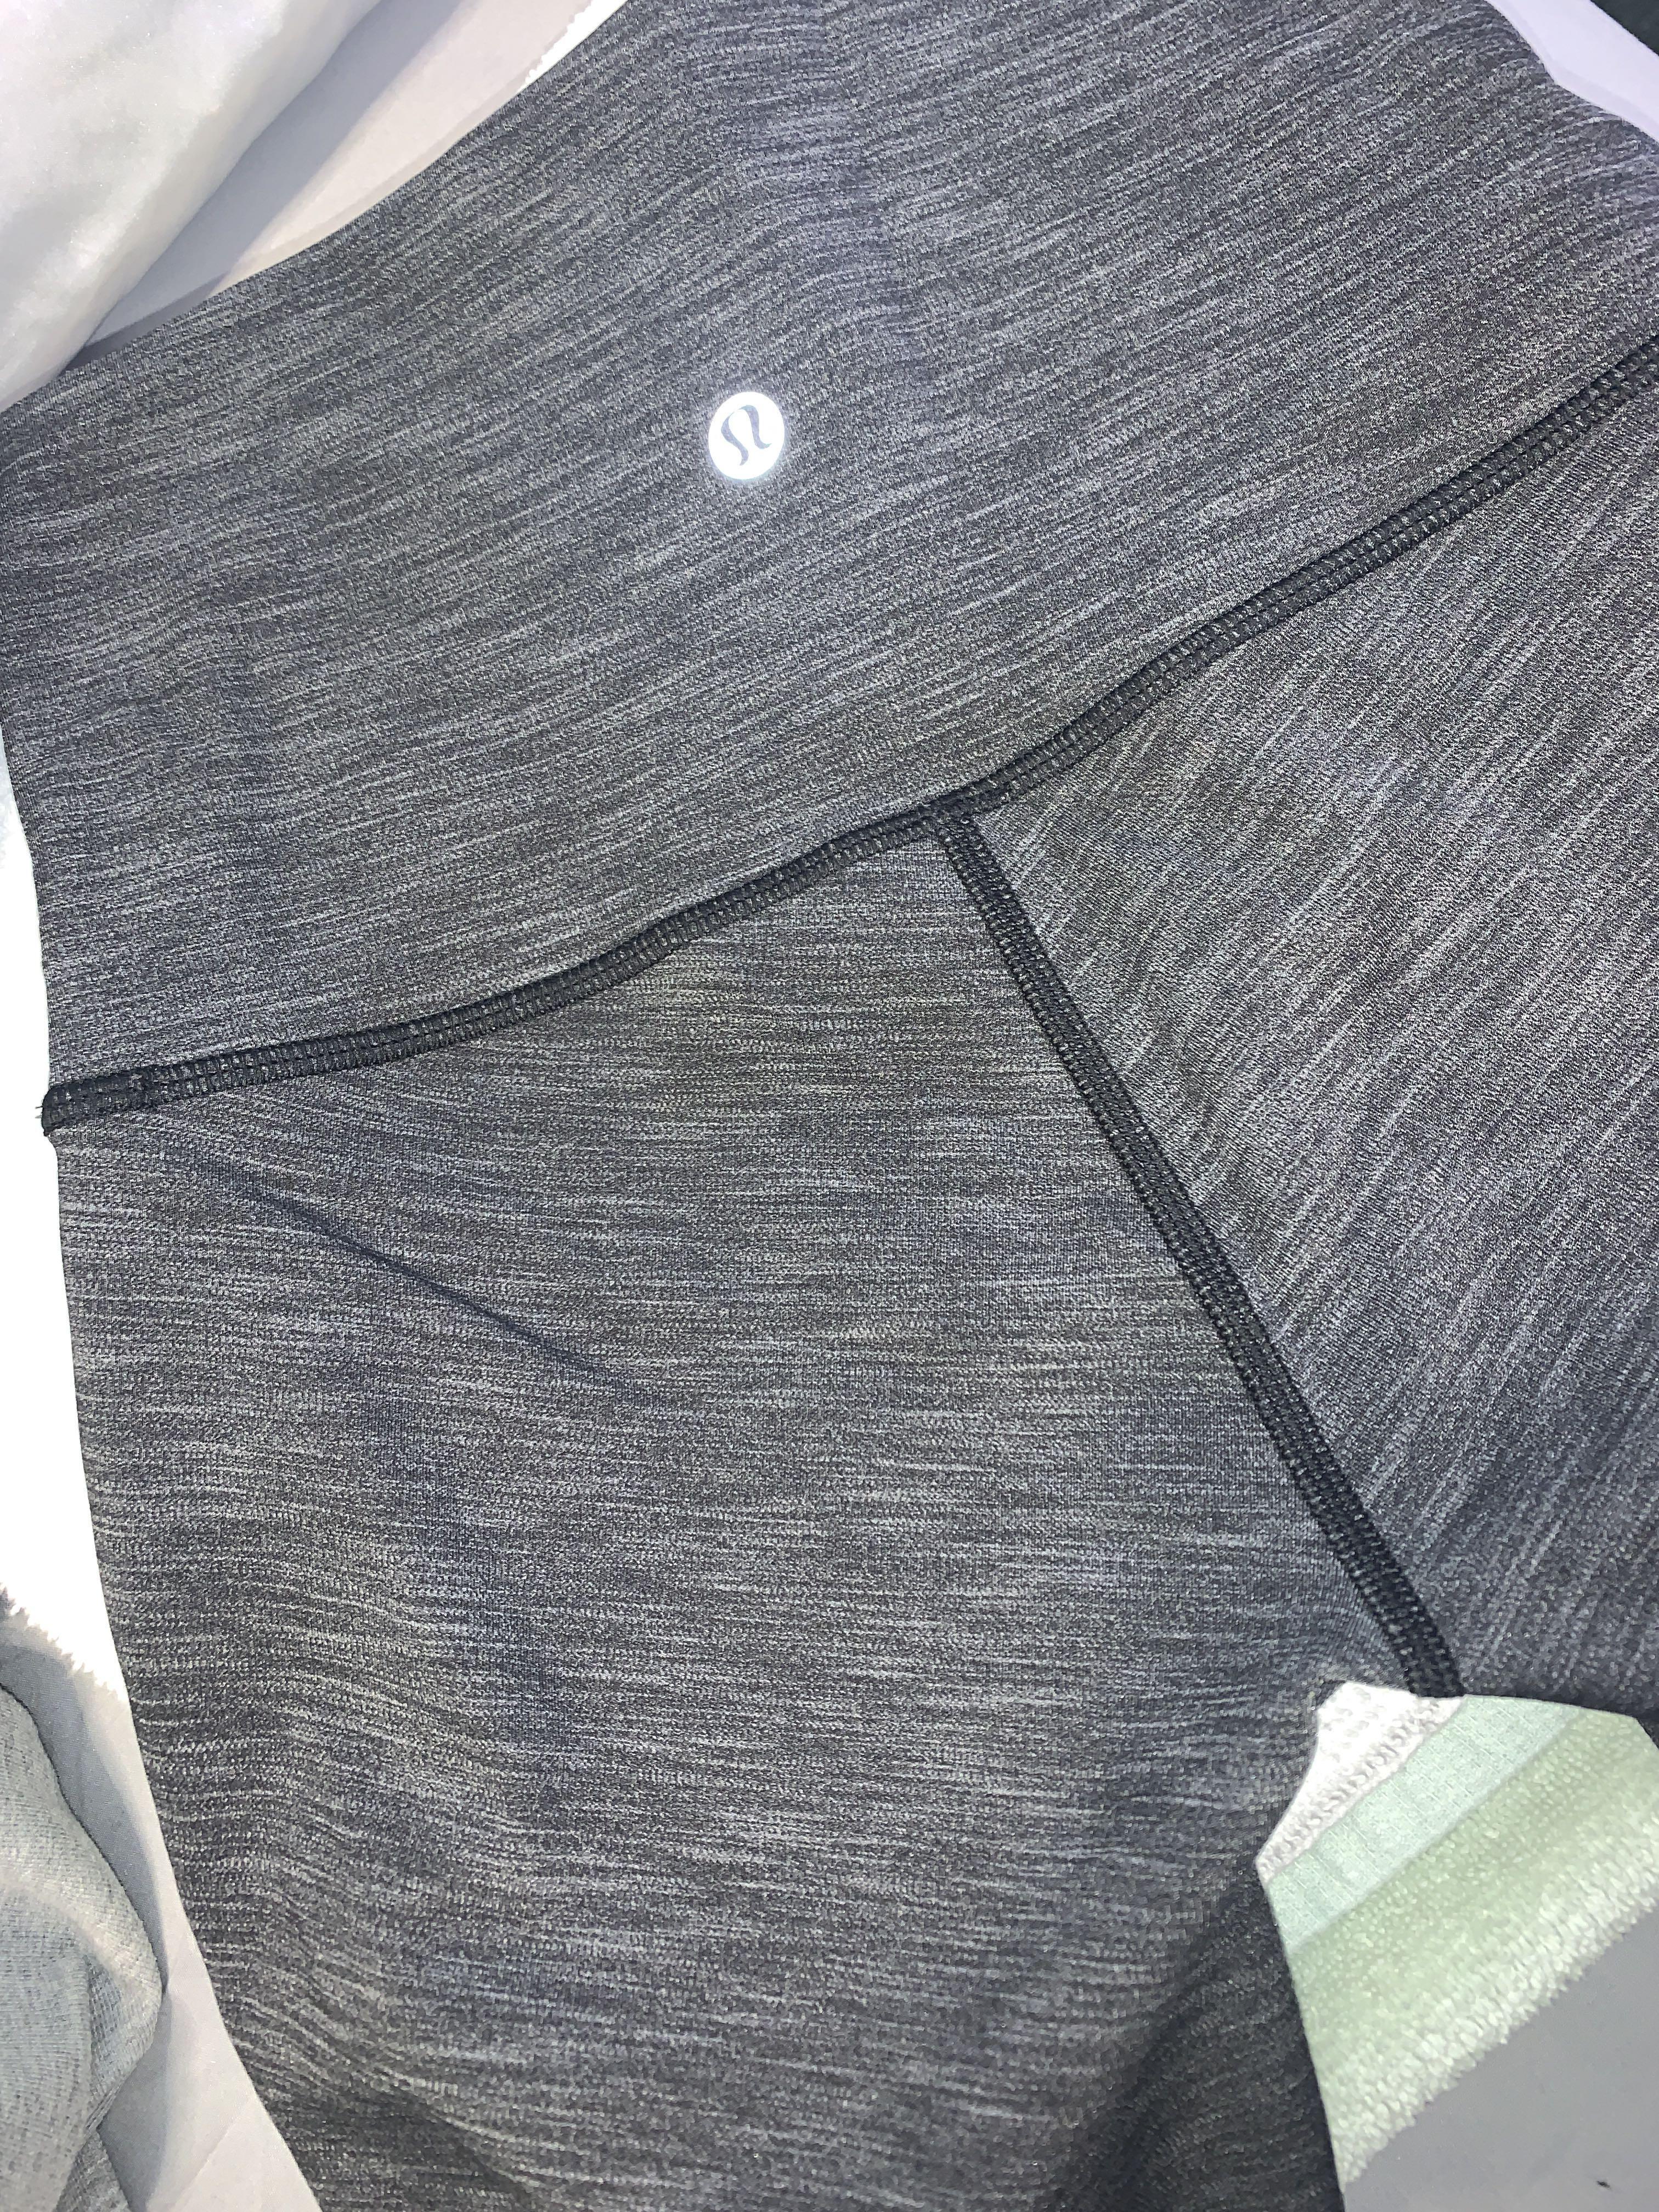 Lululemon grey tights/leggings